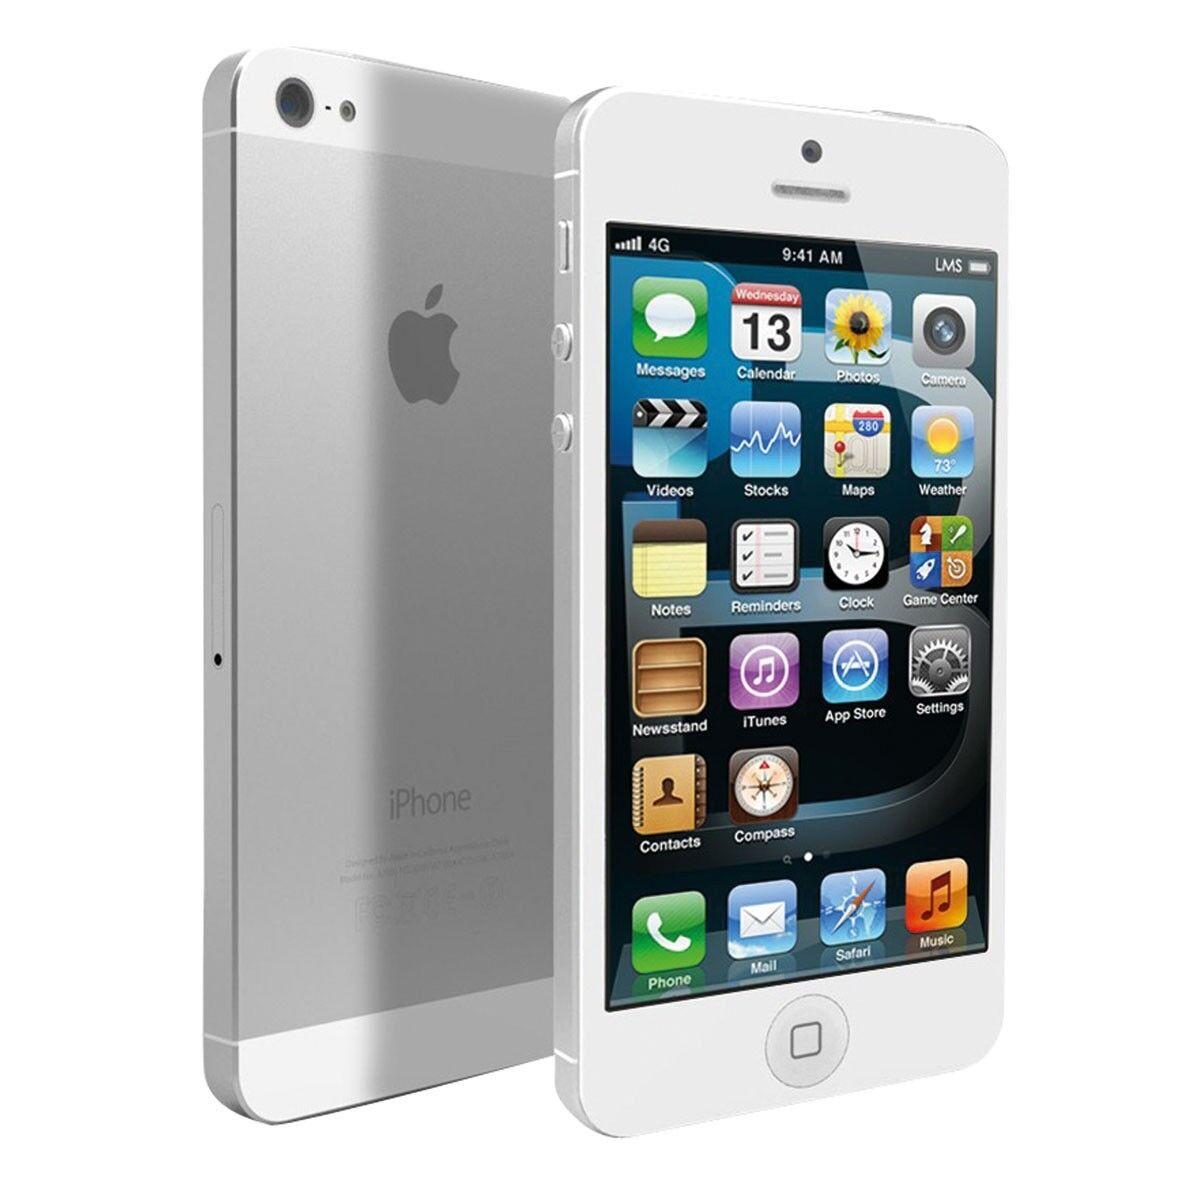 USED APPLE IPHONE 5 16GB / 32GB / 64GB - UNLOCKED / EE / O2 / VODA SMARTPHONE MOBILE